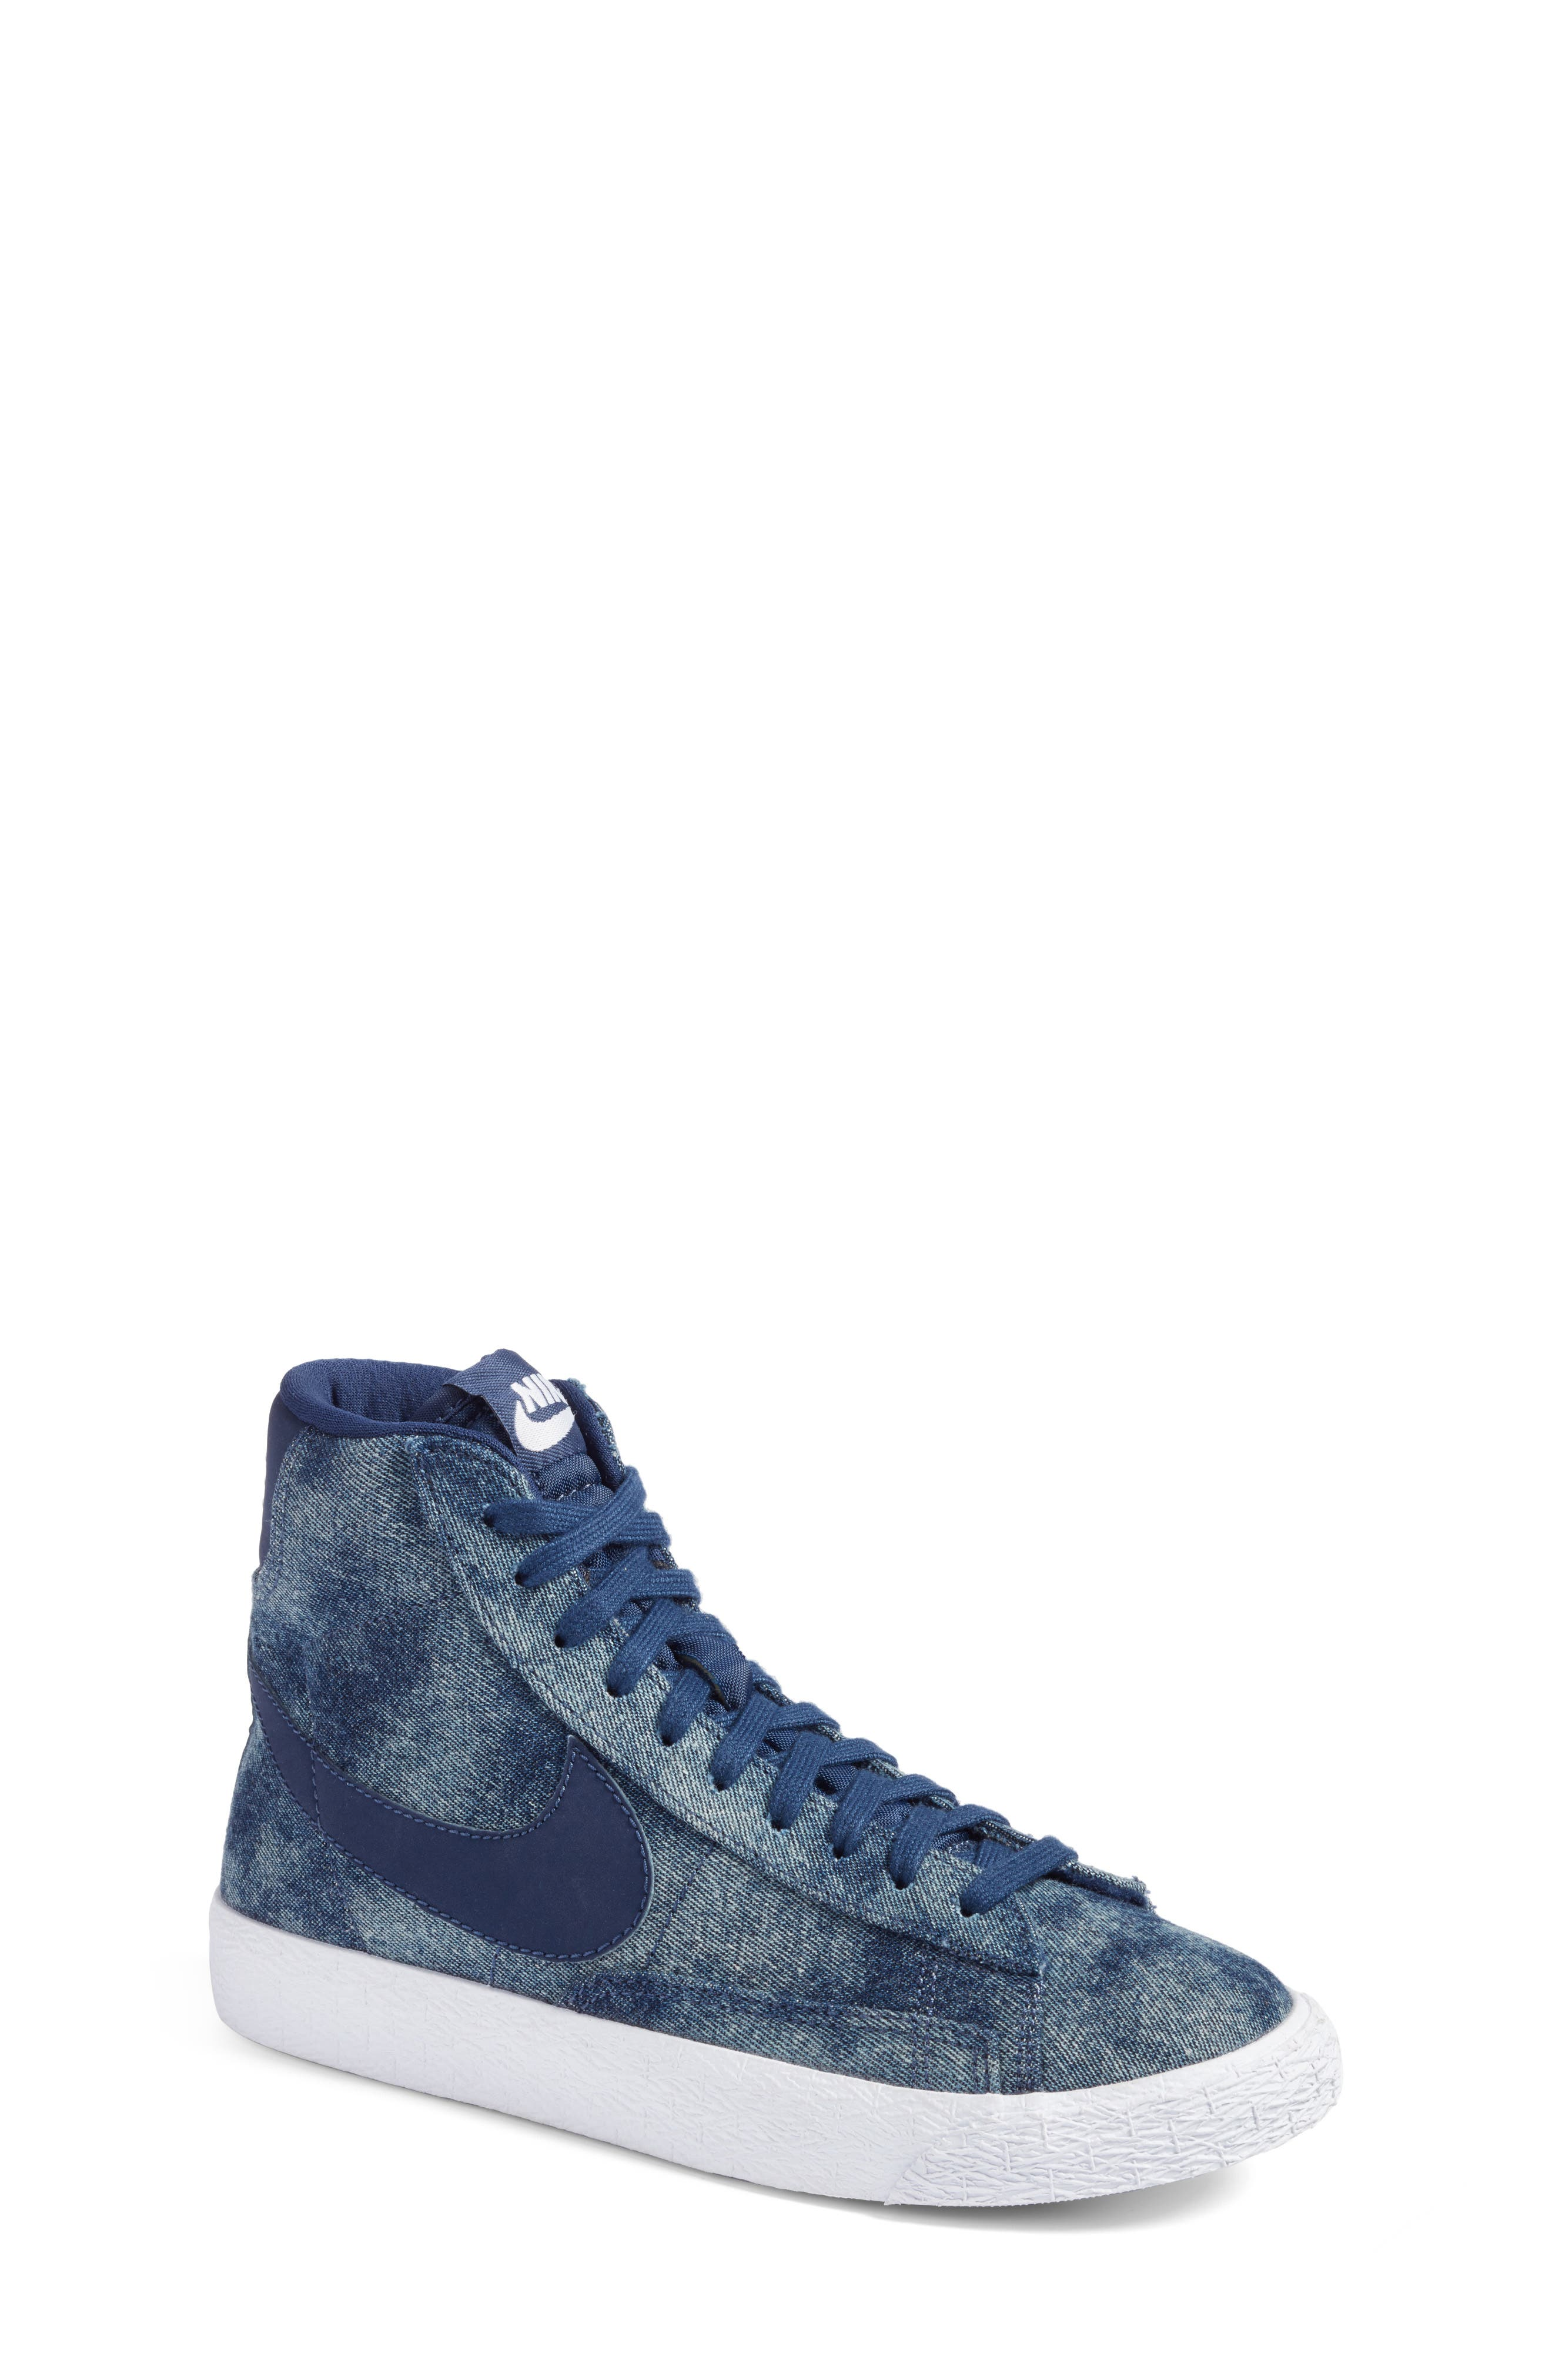 Blazer Mid SE High Top Sneaker,                             Main thumbnail 3, color,